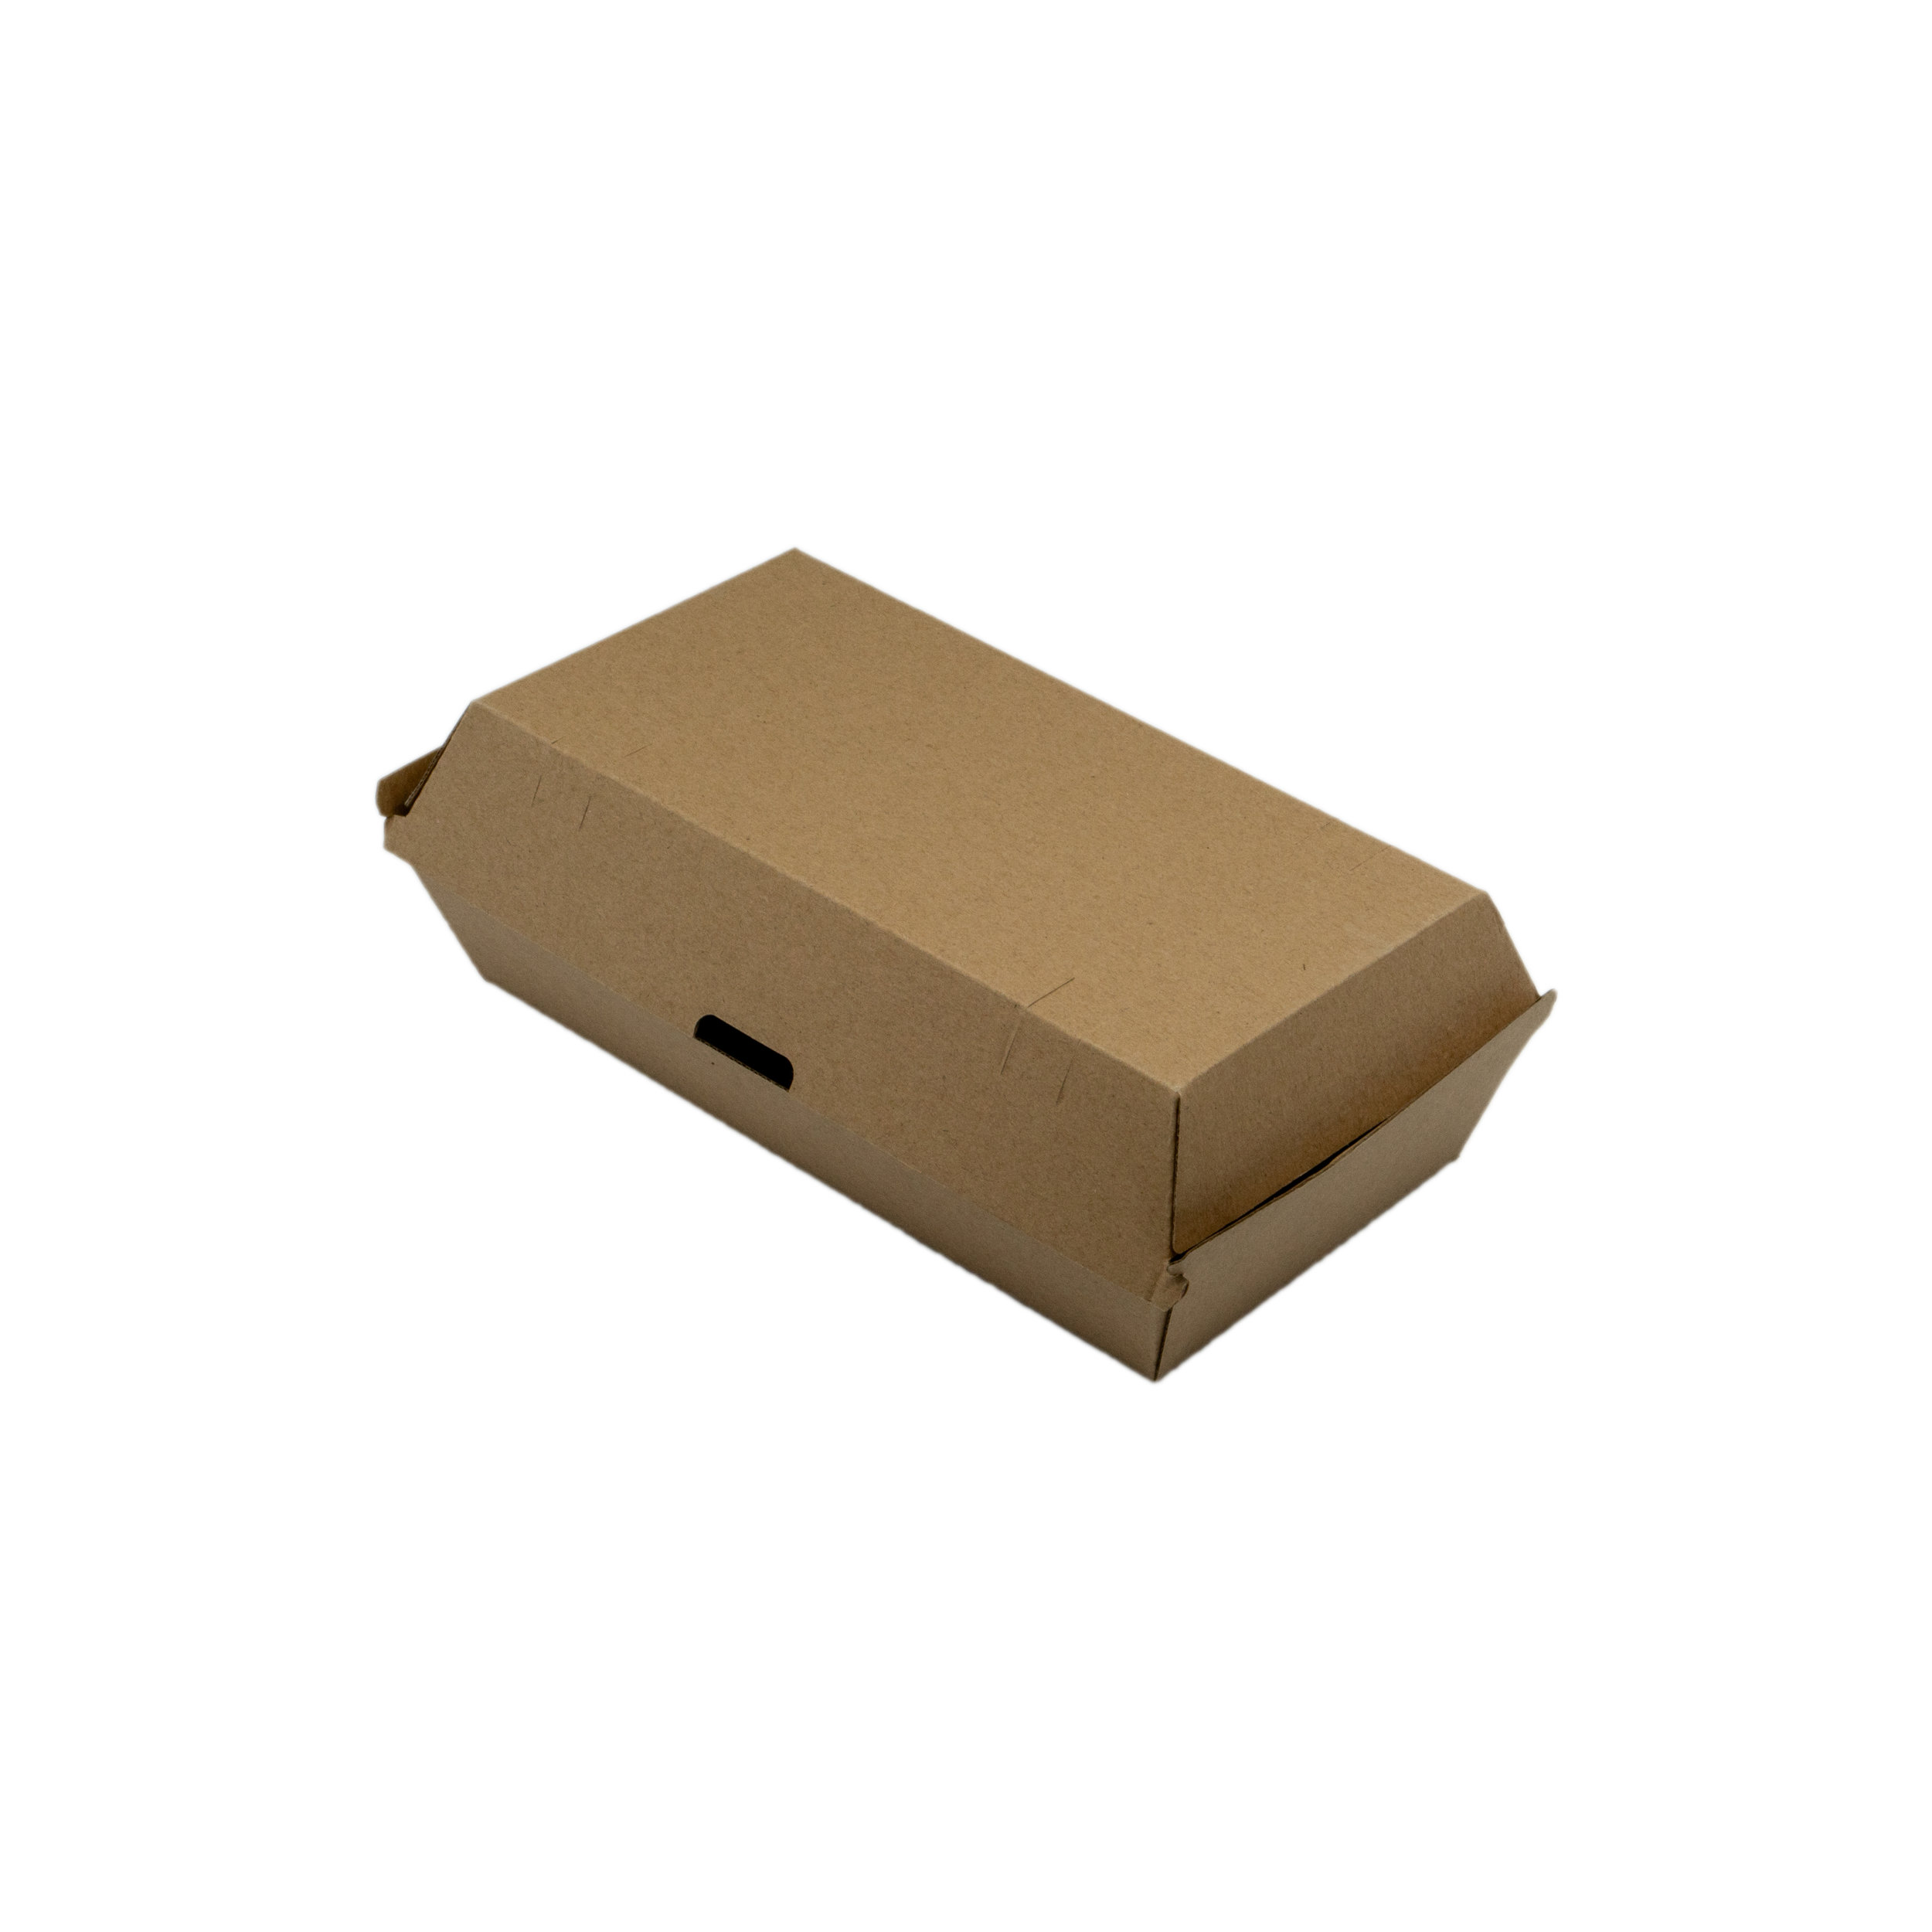 iK-EBSP3 Larger Snack Box   210x108x80mm 4x50 slv 200pcs